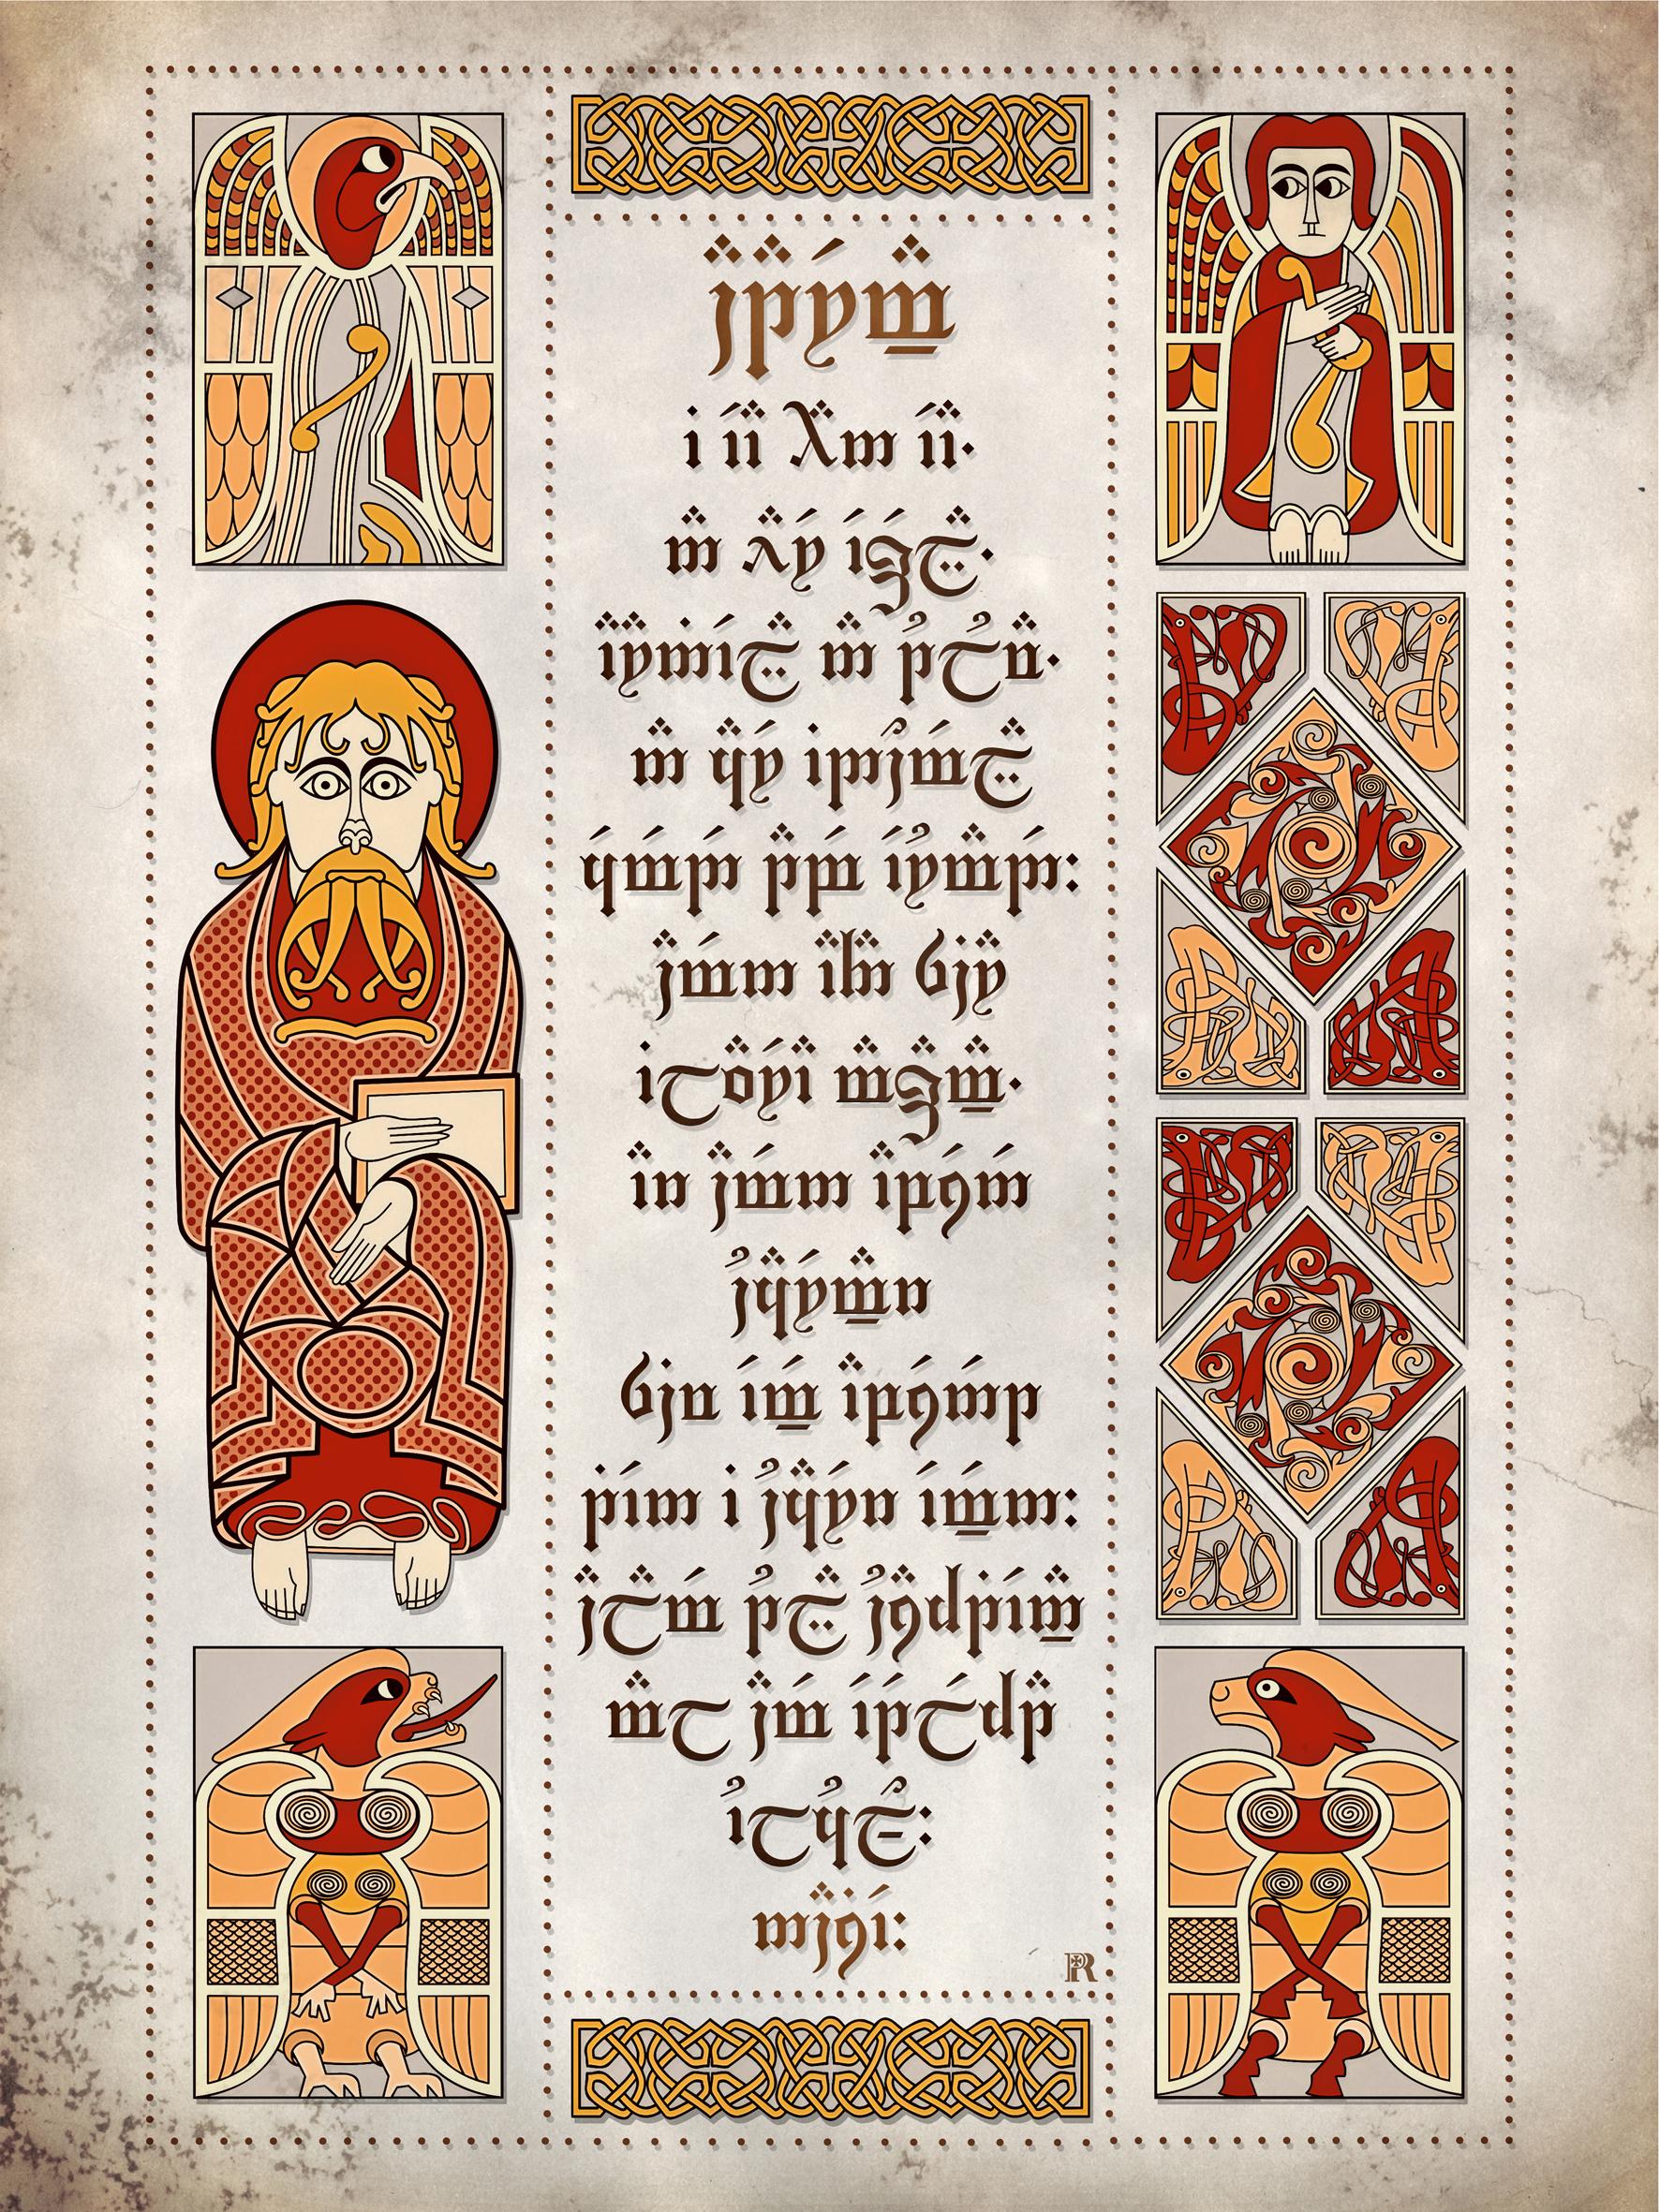 Ataremma VI - The Lords Prayer in Quenya Tolkien